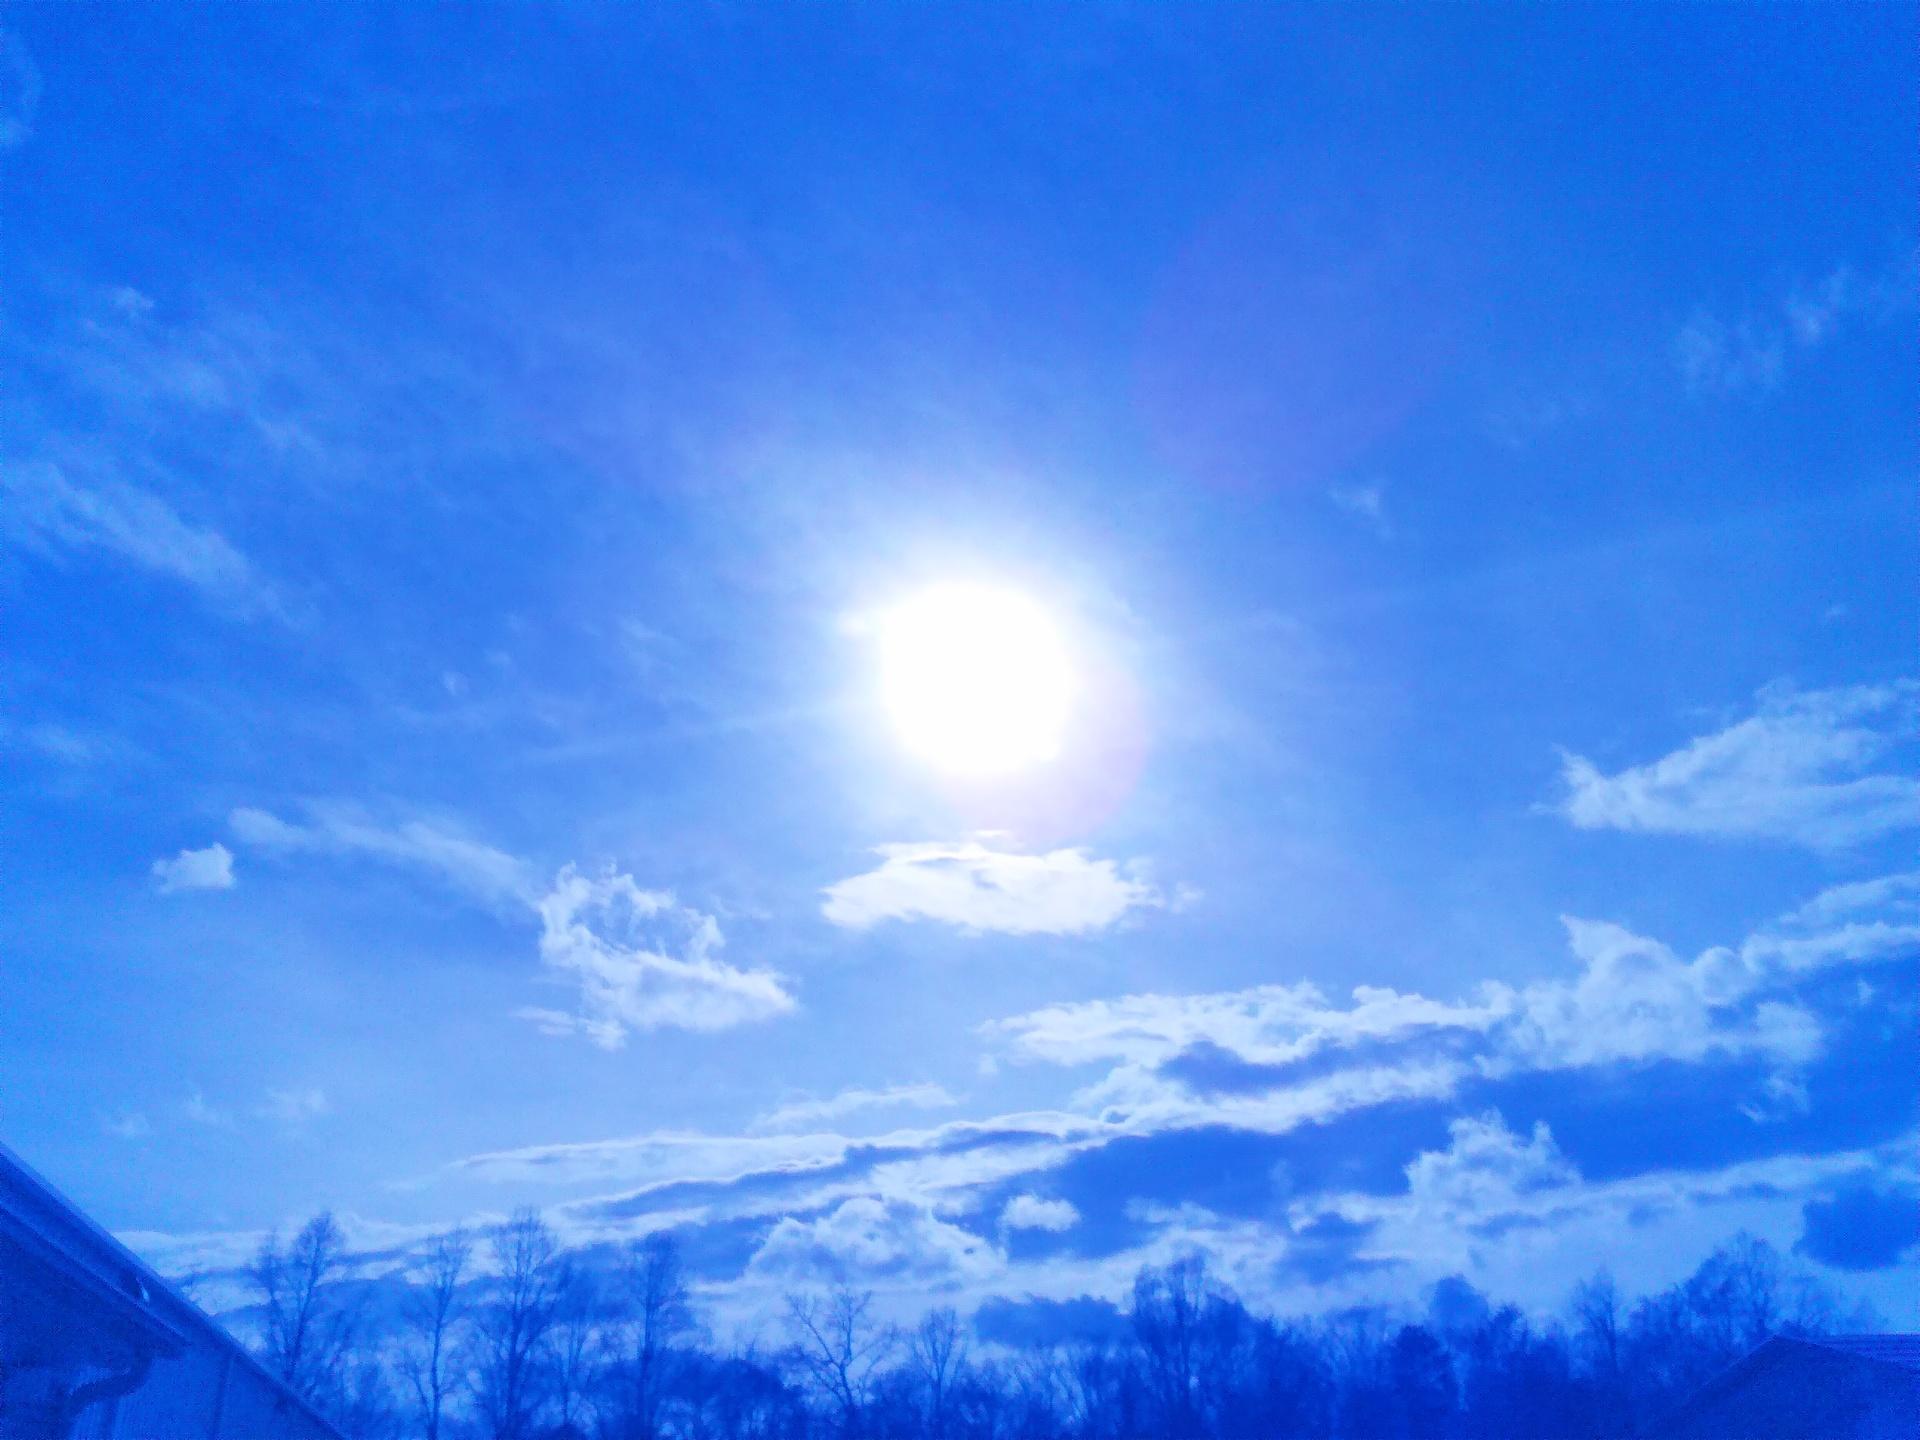 Hanging sun | codenamesailorearth, air, background, bright